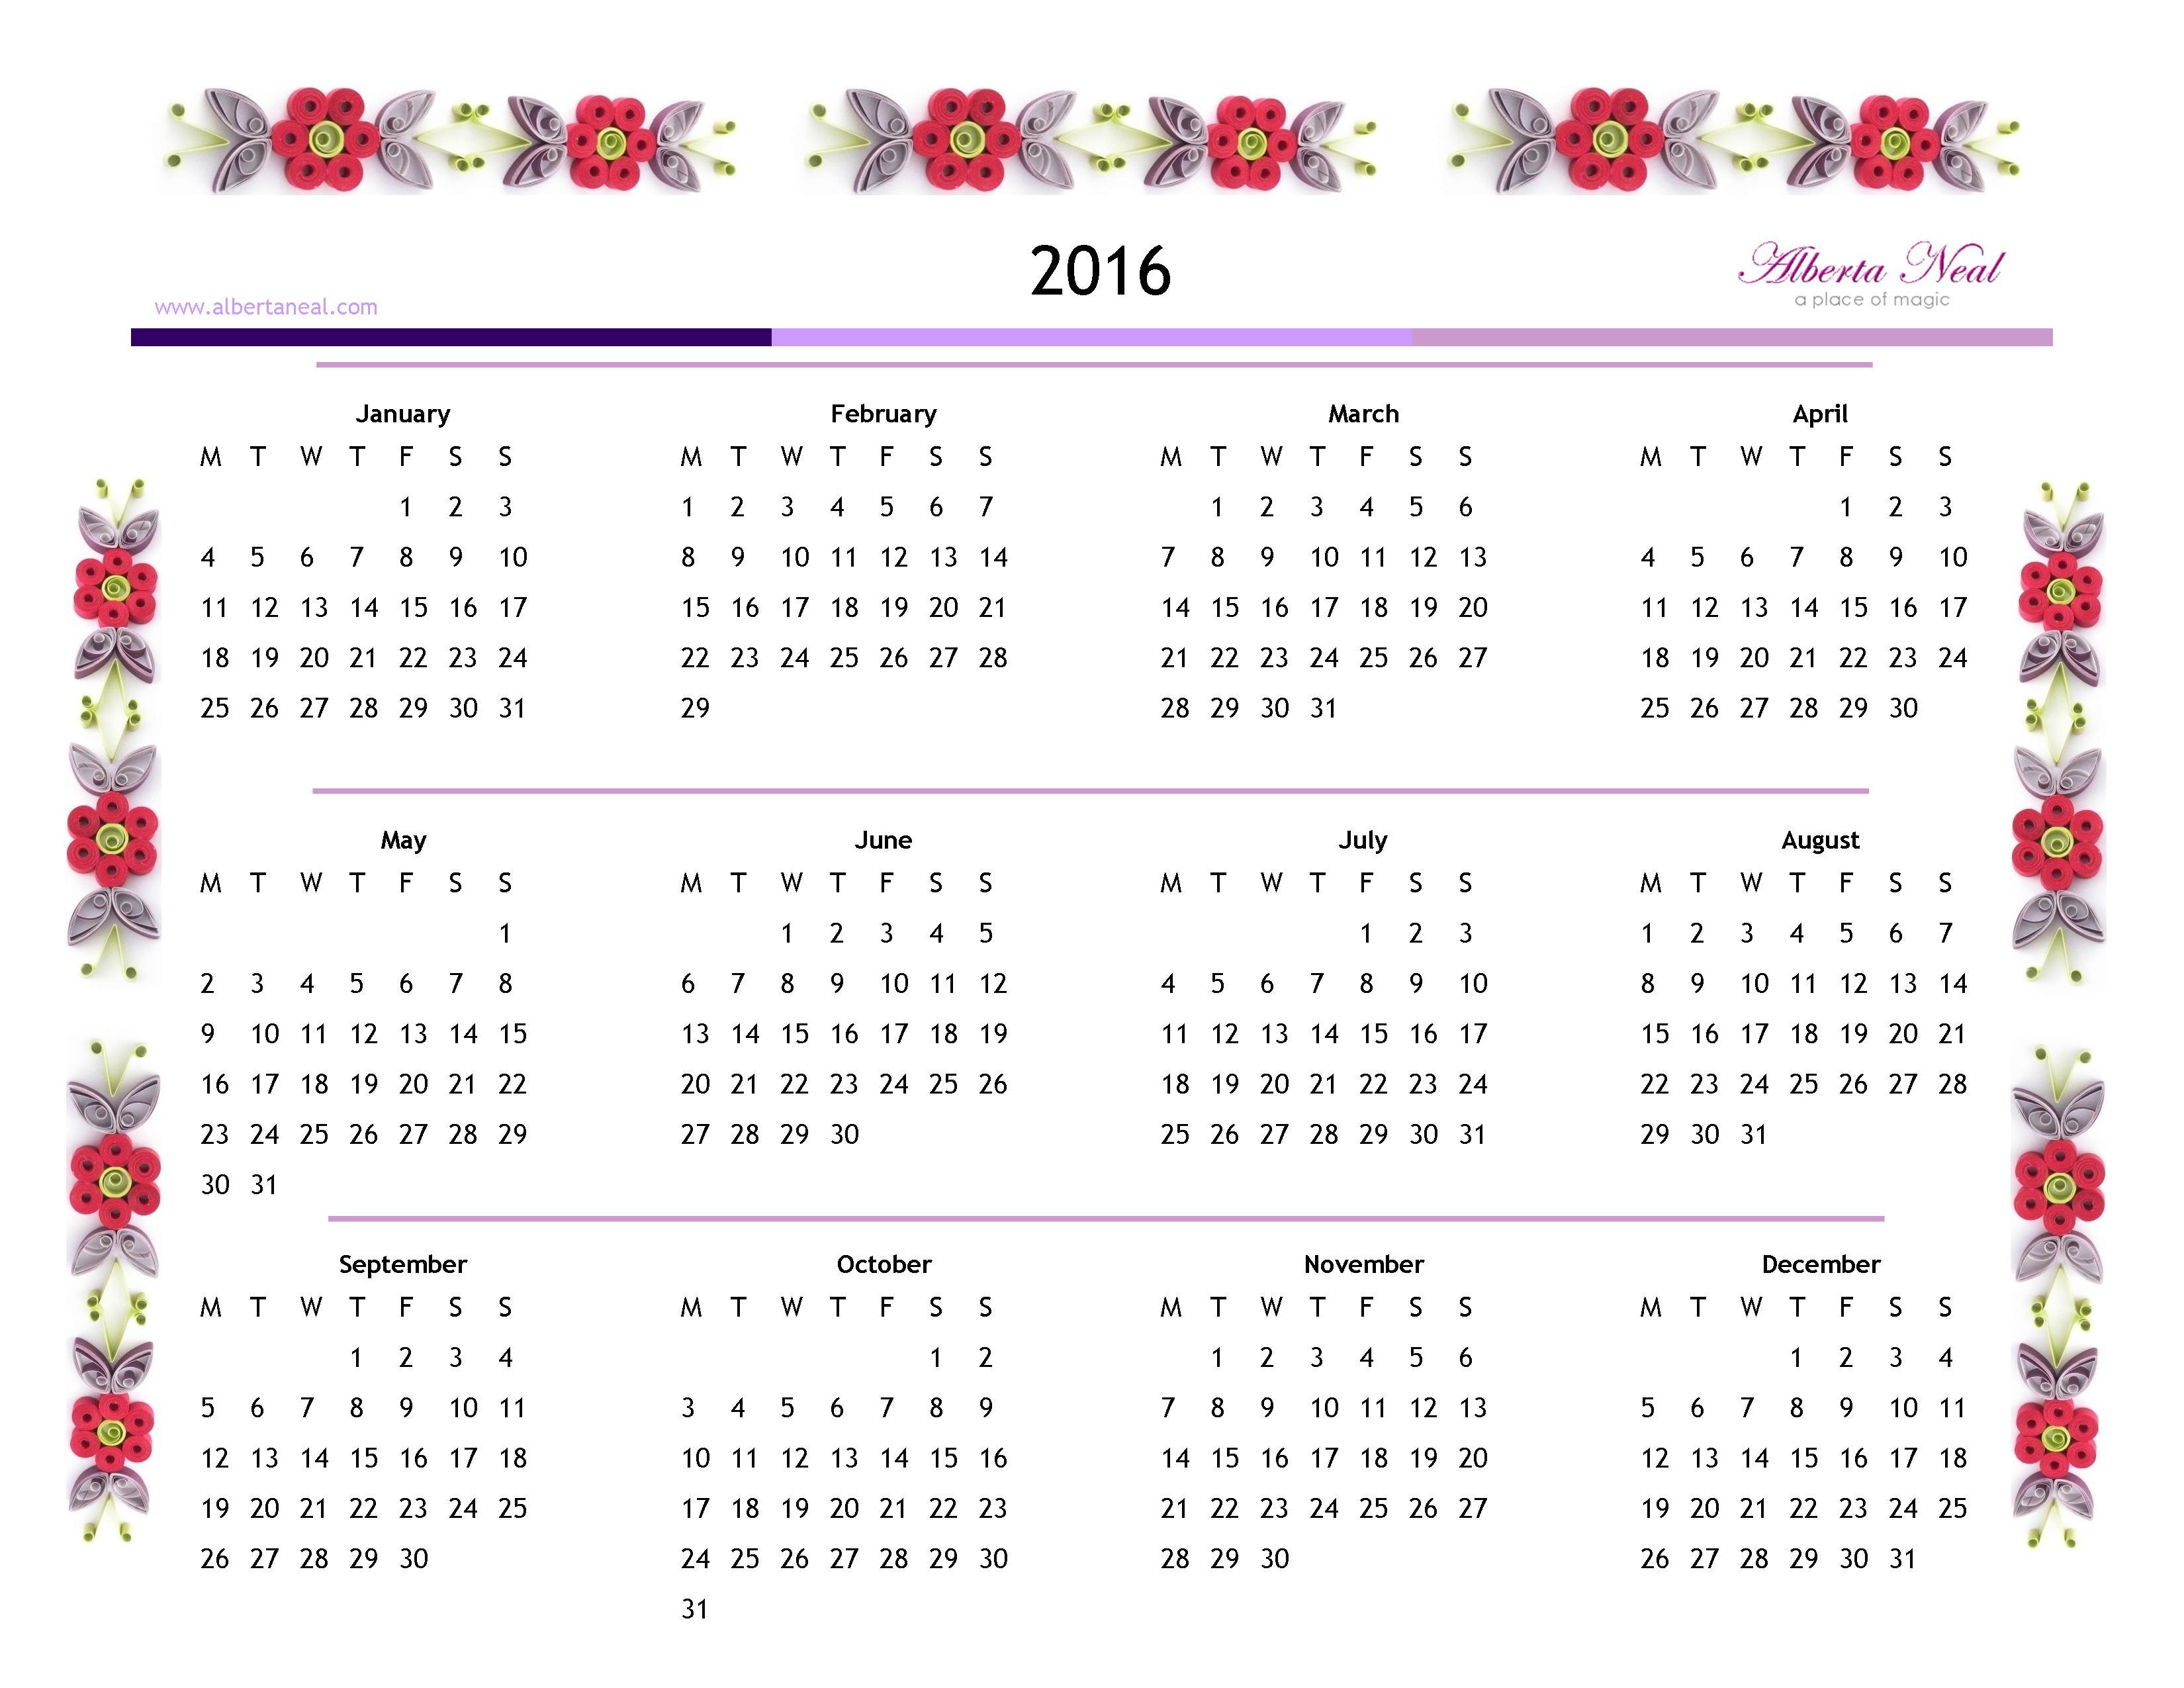 2016 calendar v2 alberta neal